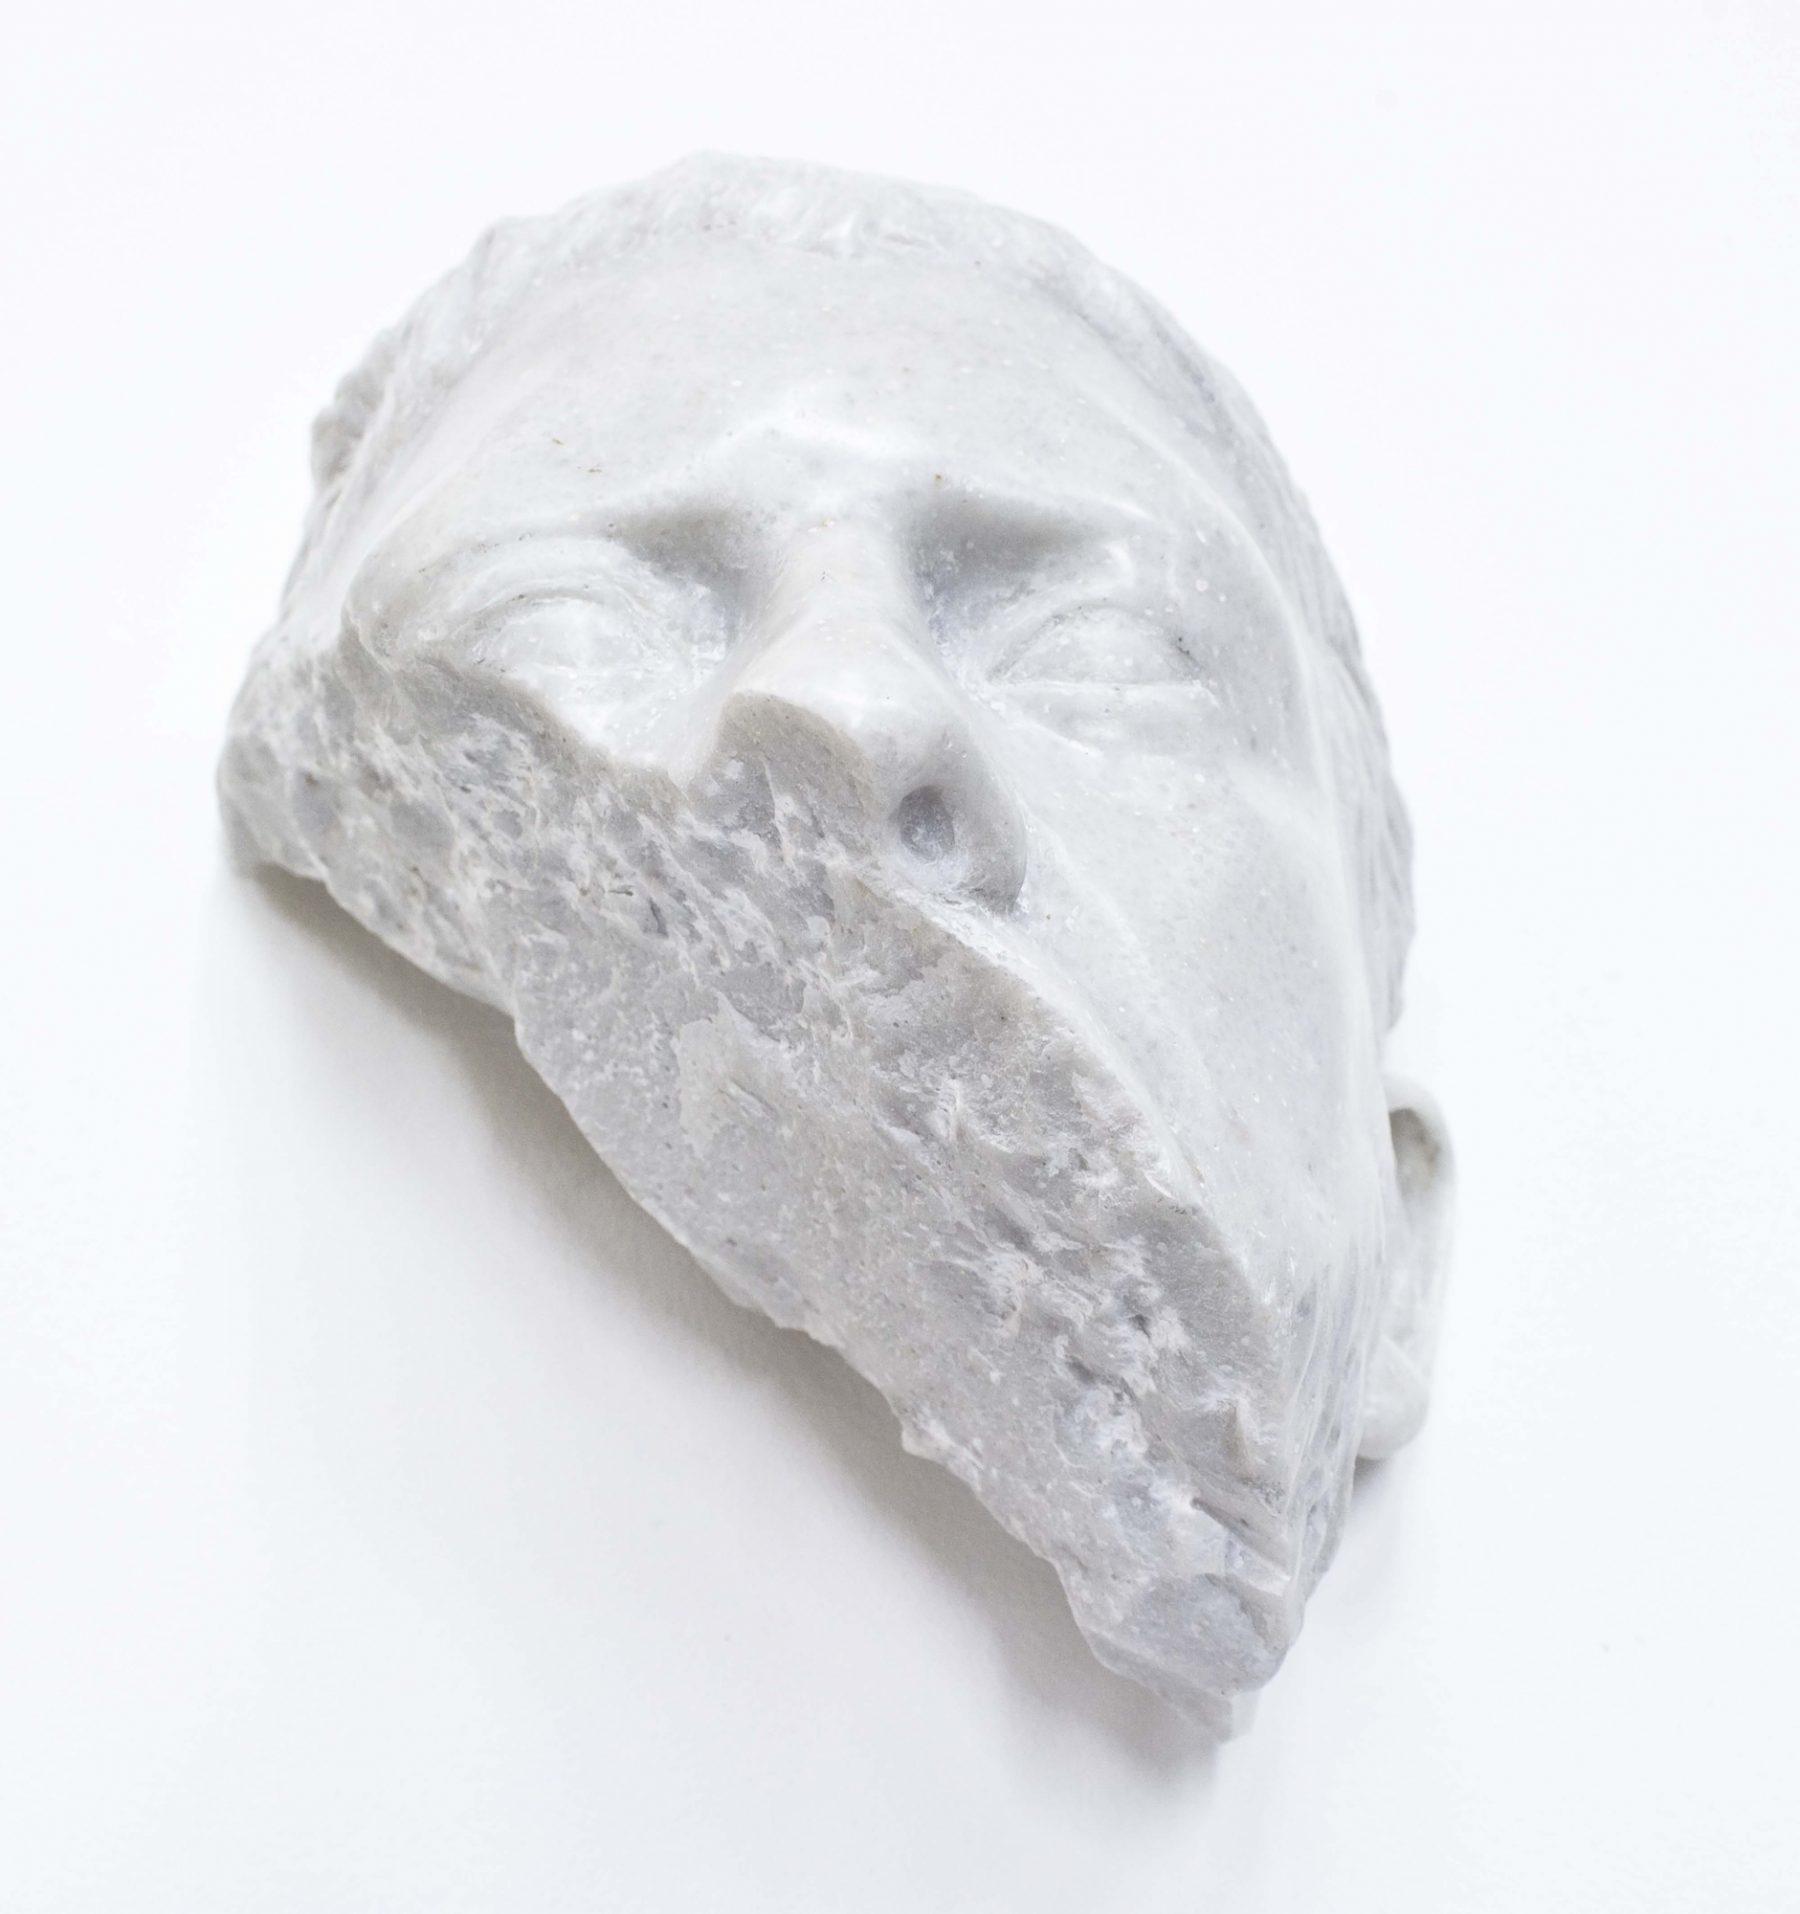 Fragment (face)